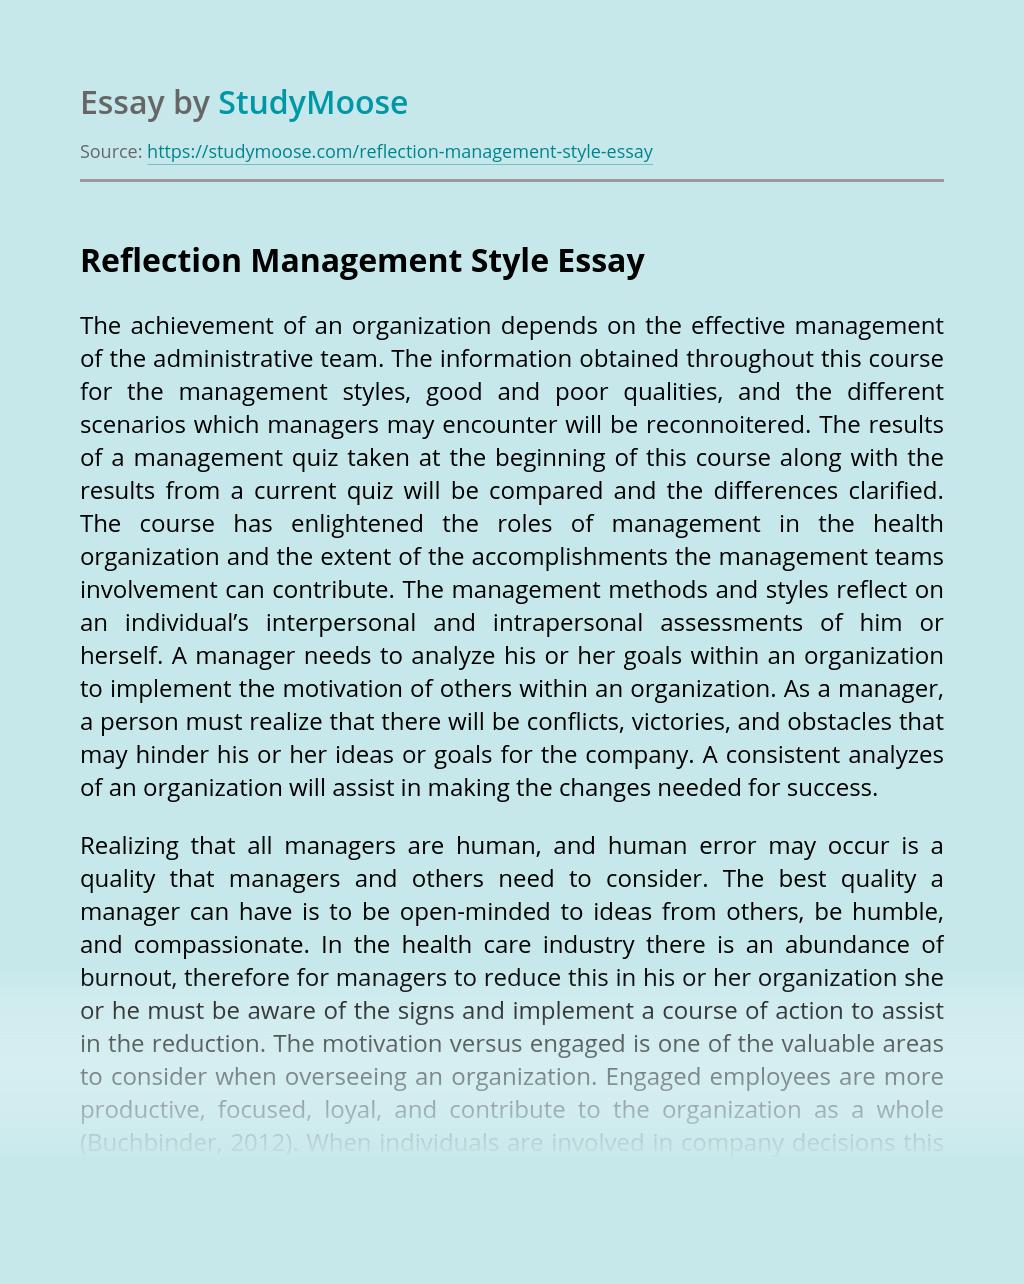 Reflection Management Style